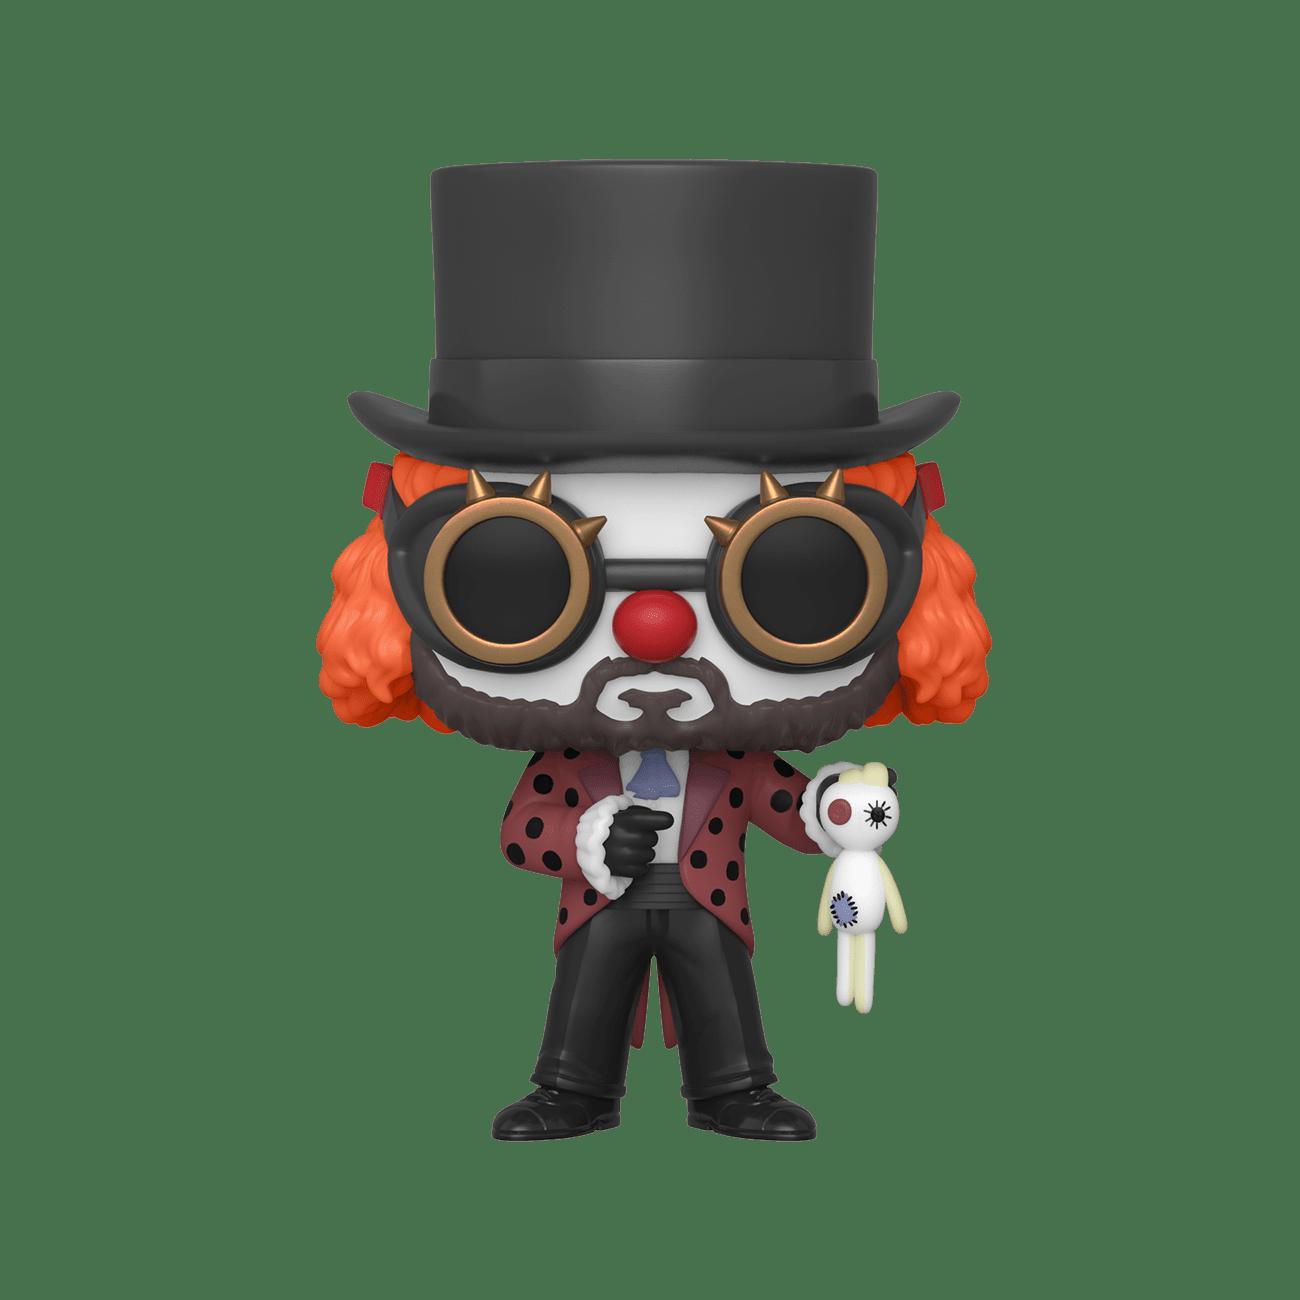 La Casa de Papel! Professor O Clown Funko Pop! Figure - 4th Batch